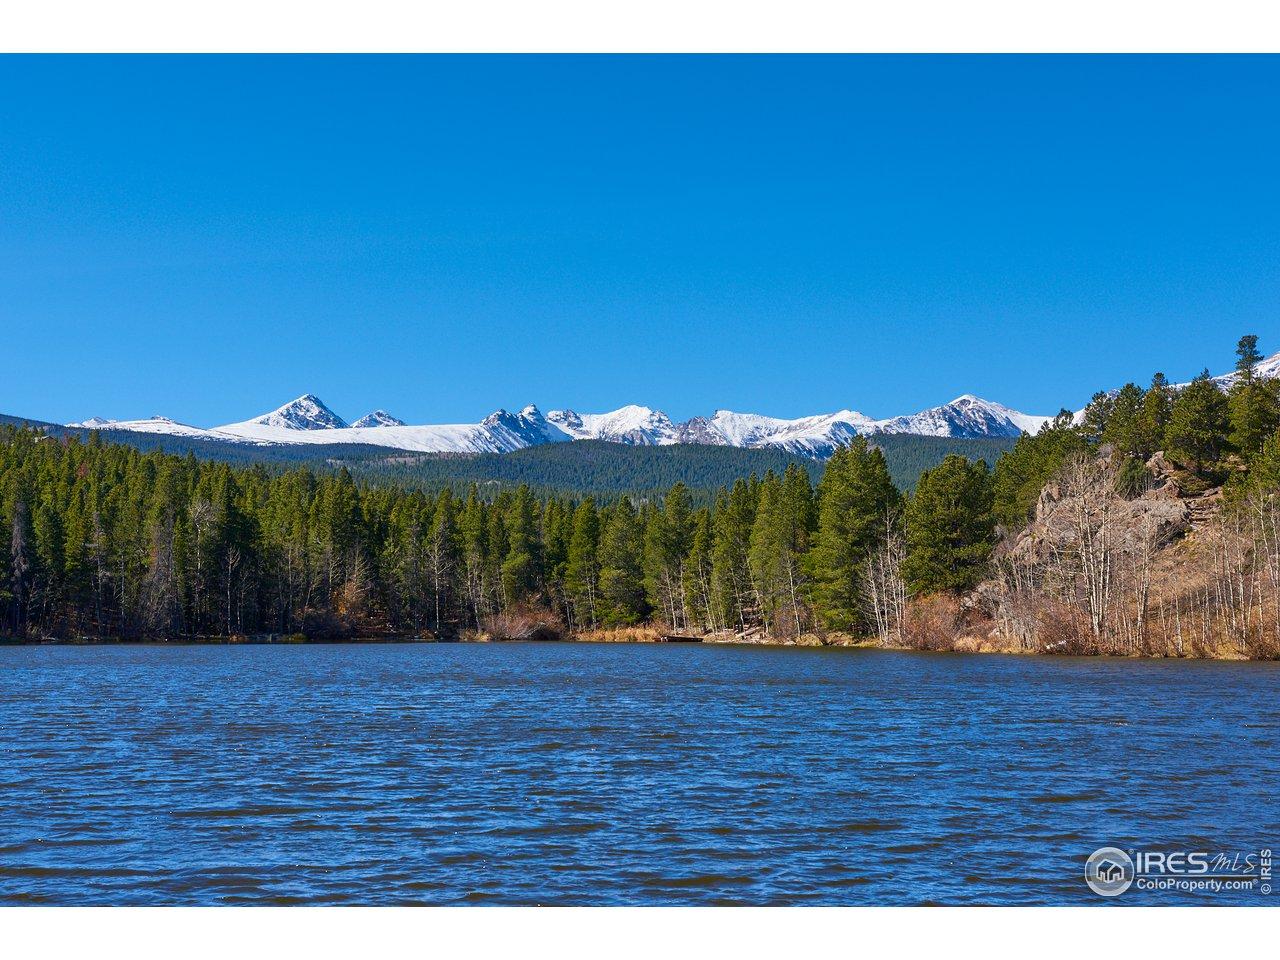 Dramatic mountain views from large alpine lake